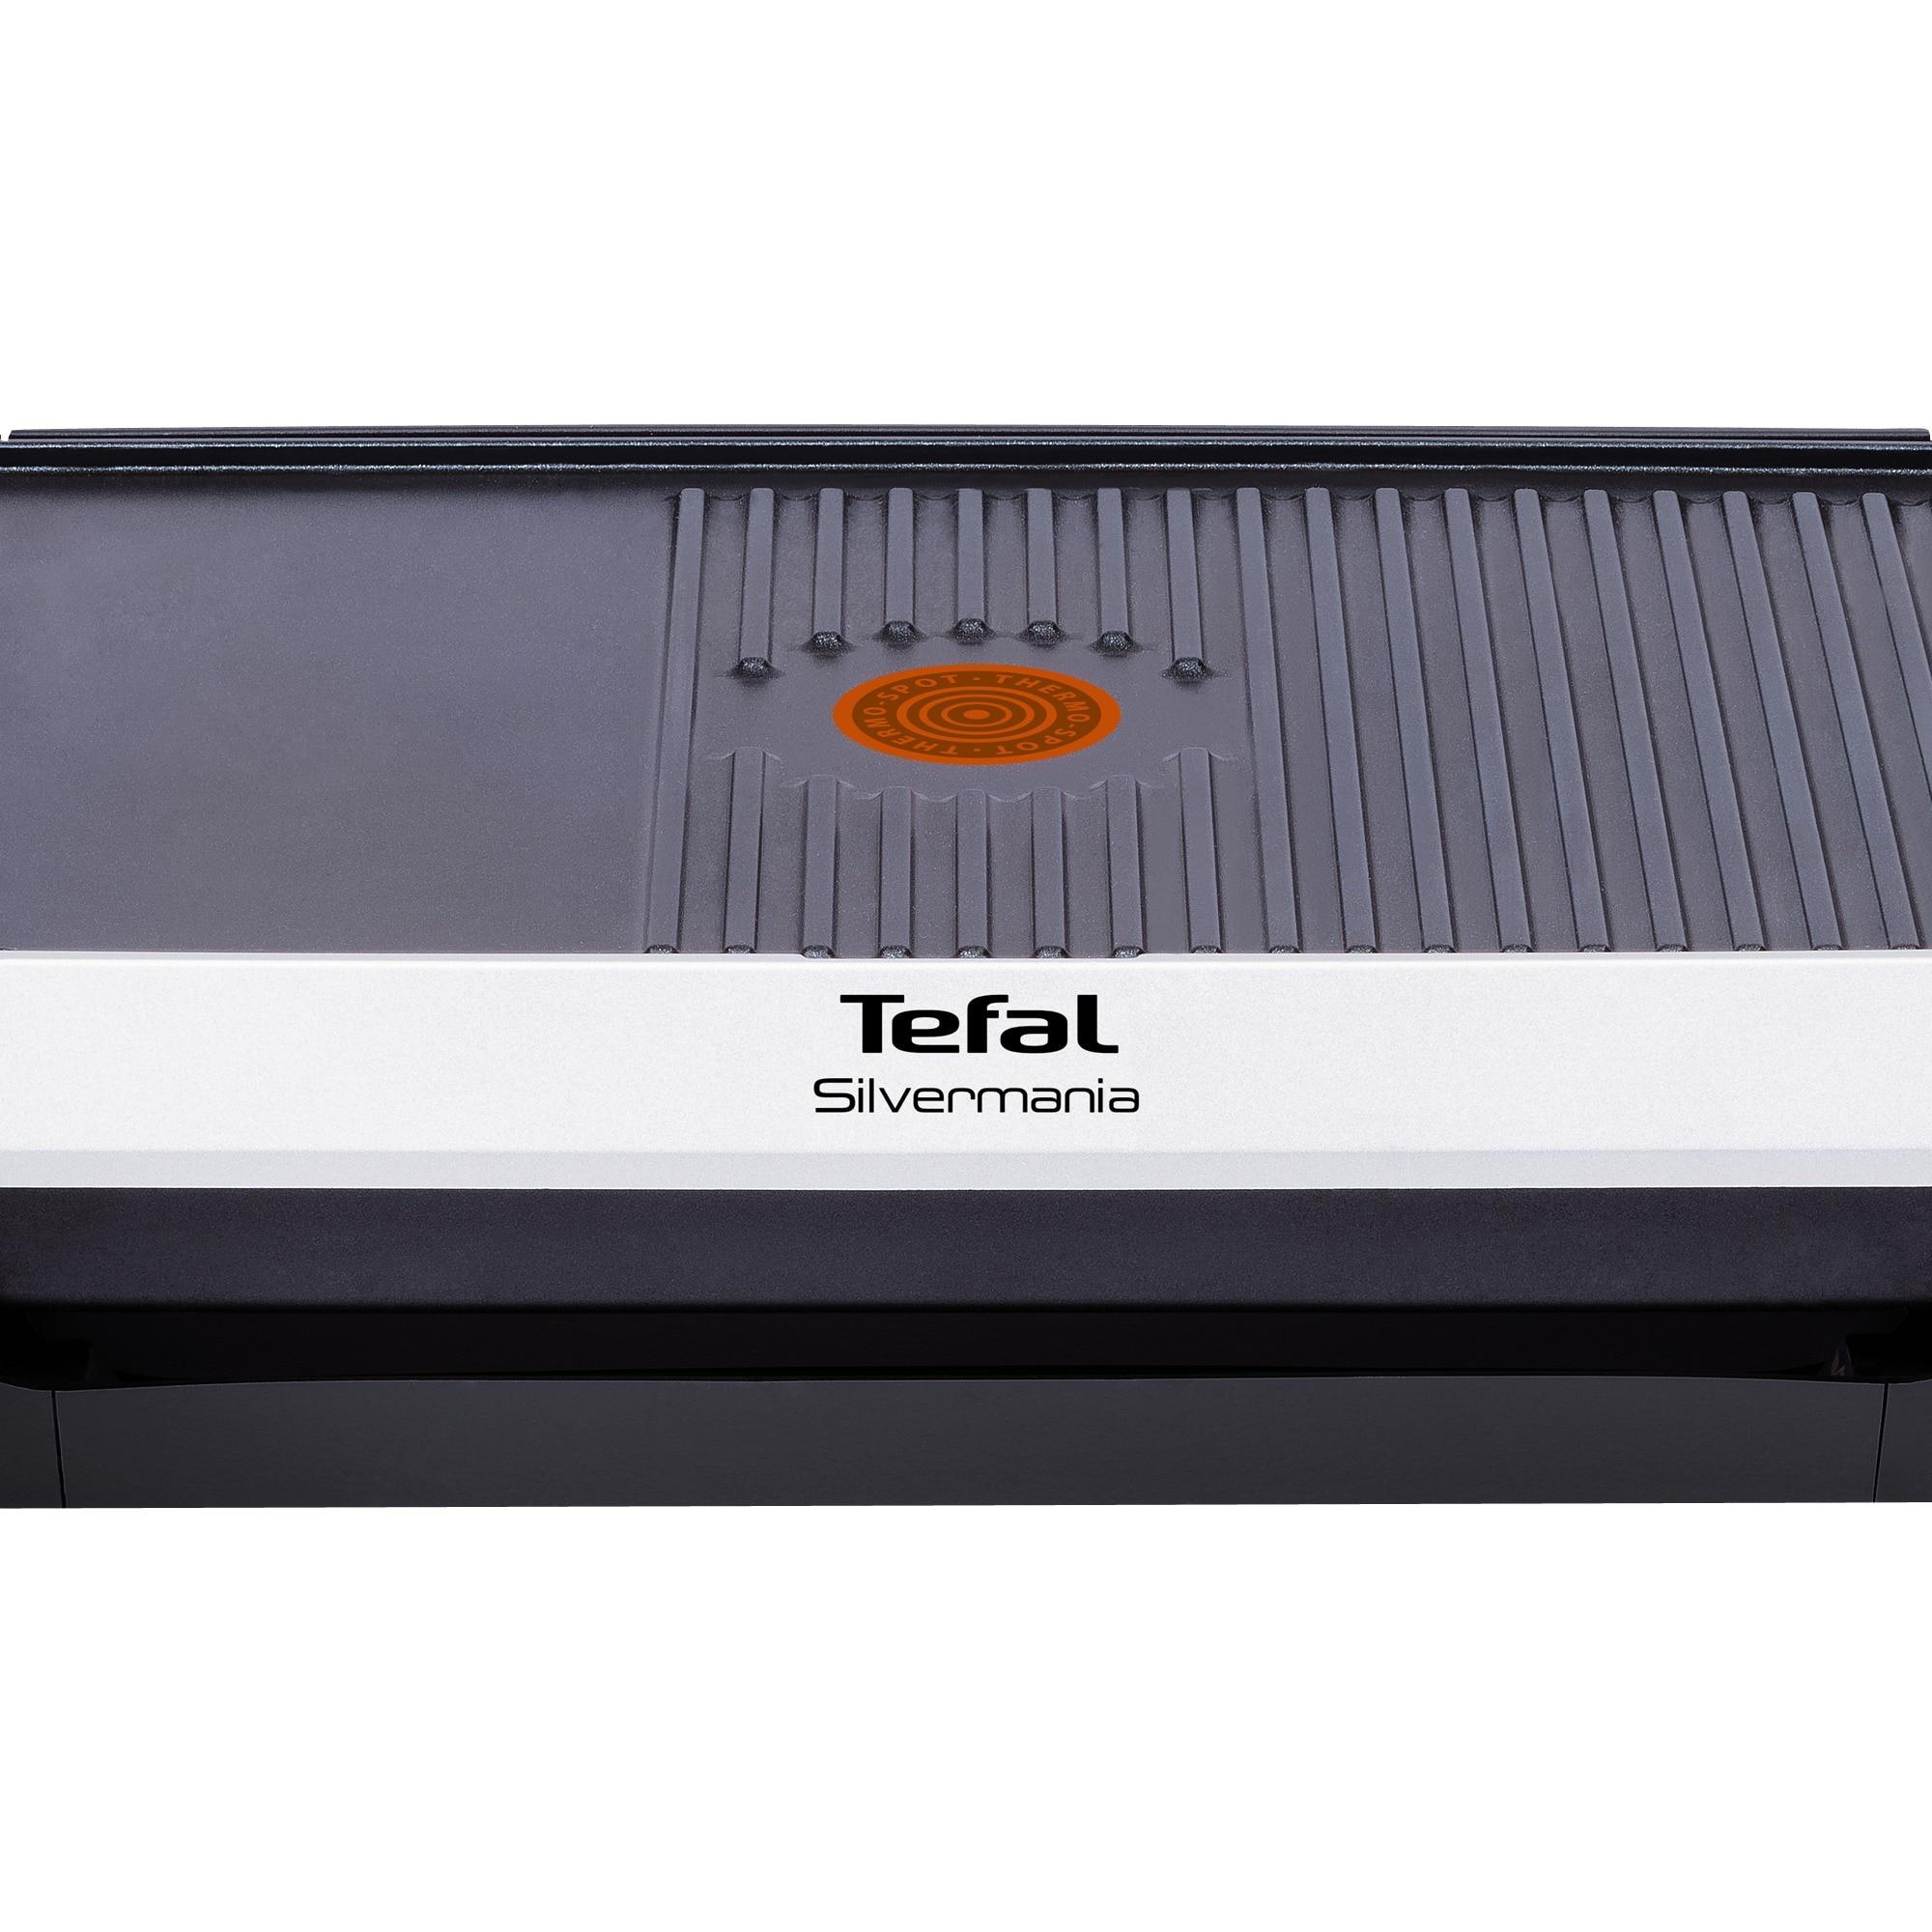 Tefal Elektro-Tischgrill Silvermania CB 6718 schwarz Kunststoff Silvermania